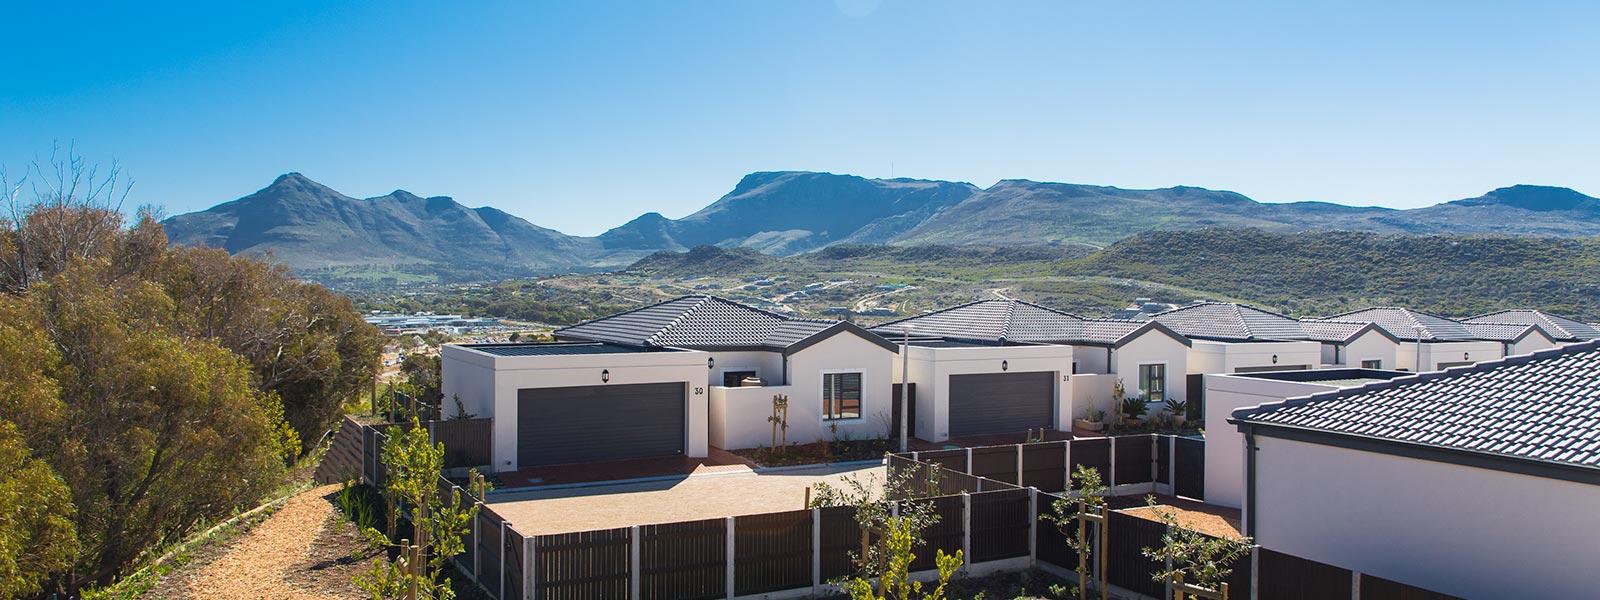 Evergreen Noordhoek – Evergreen Lifestyle Villages : Evergreen